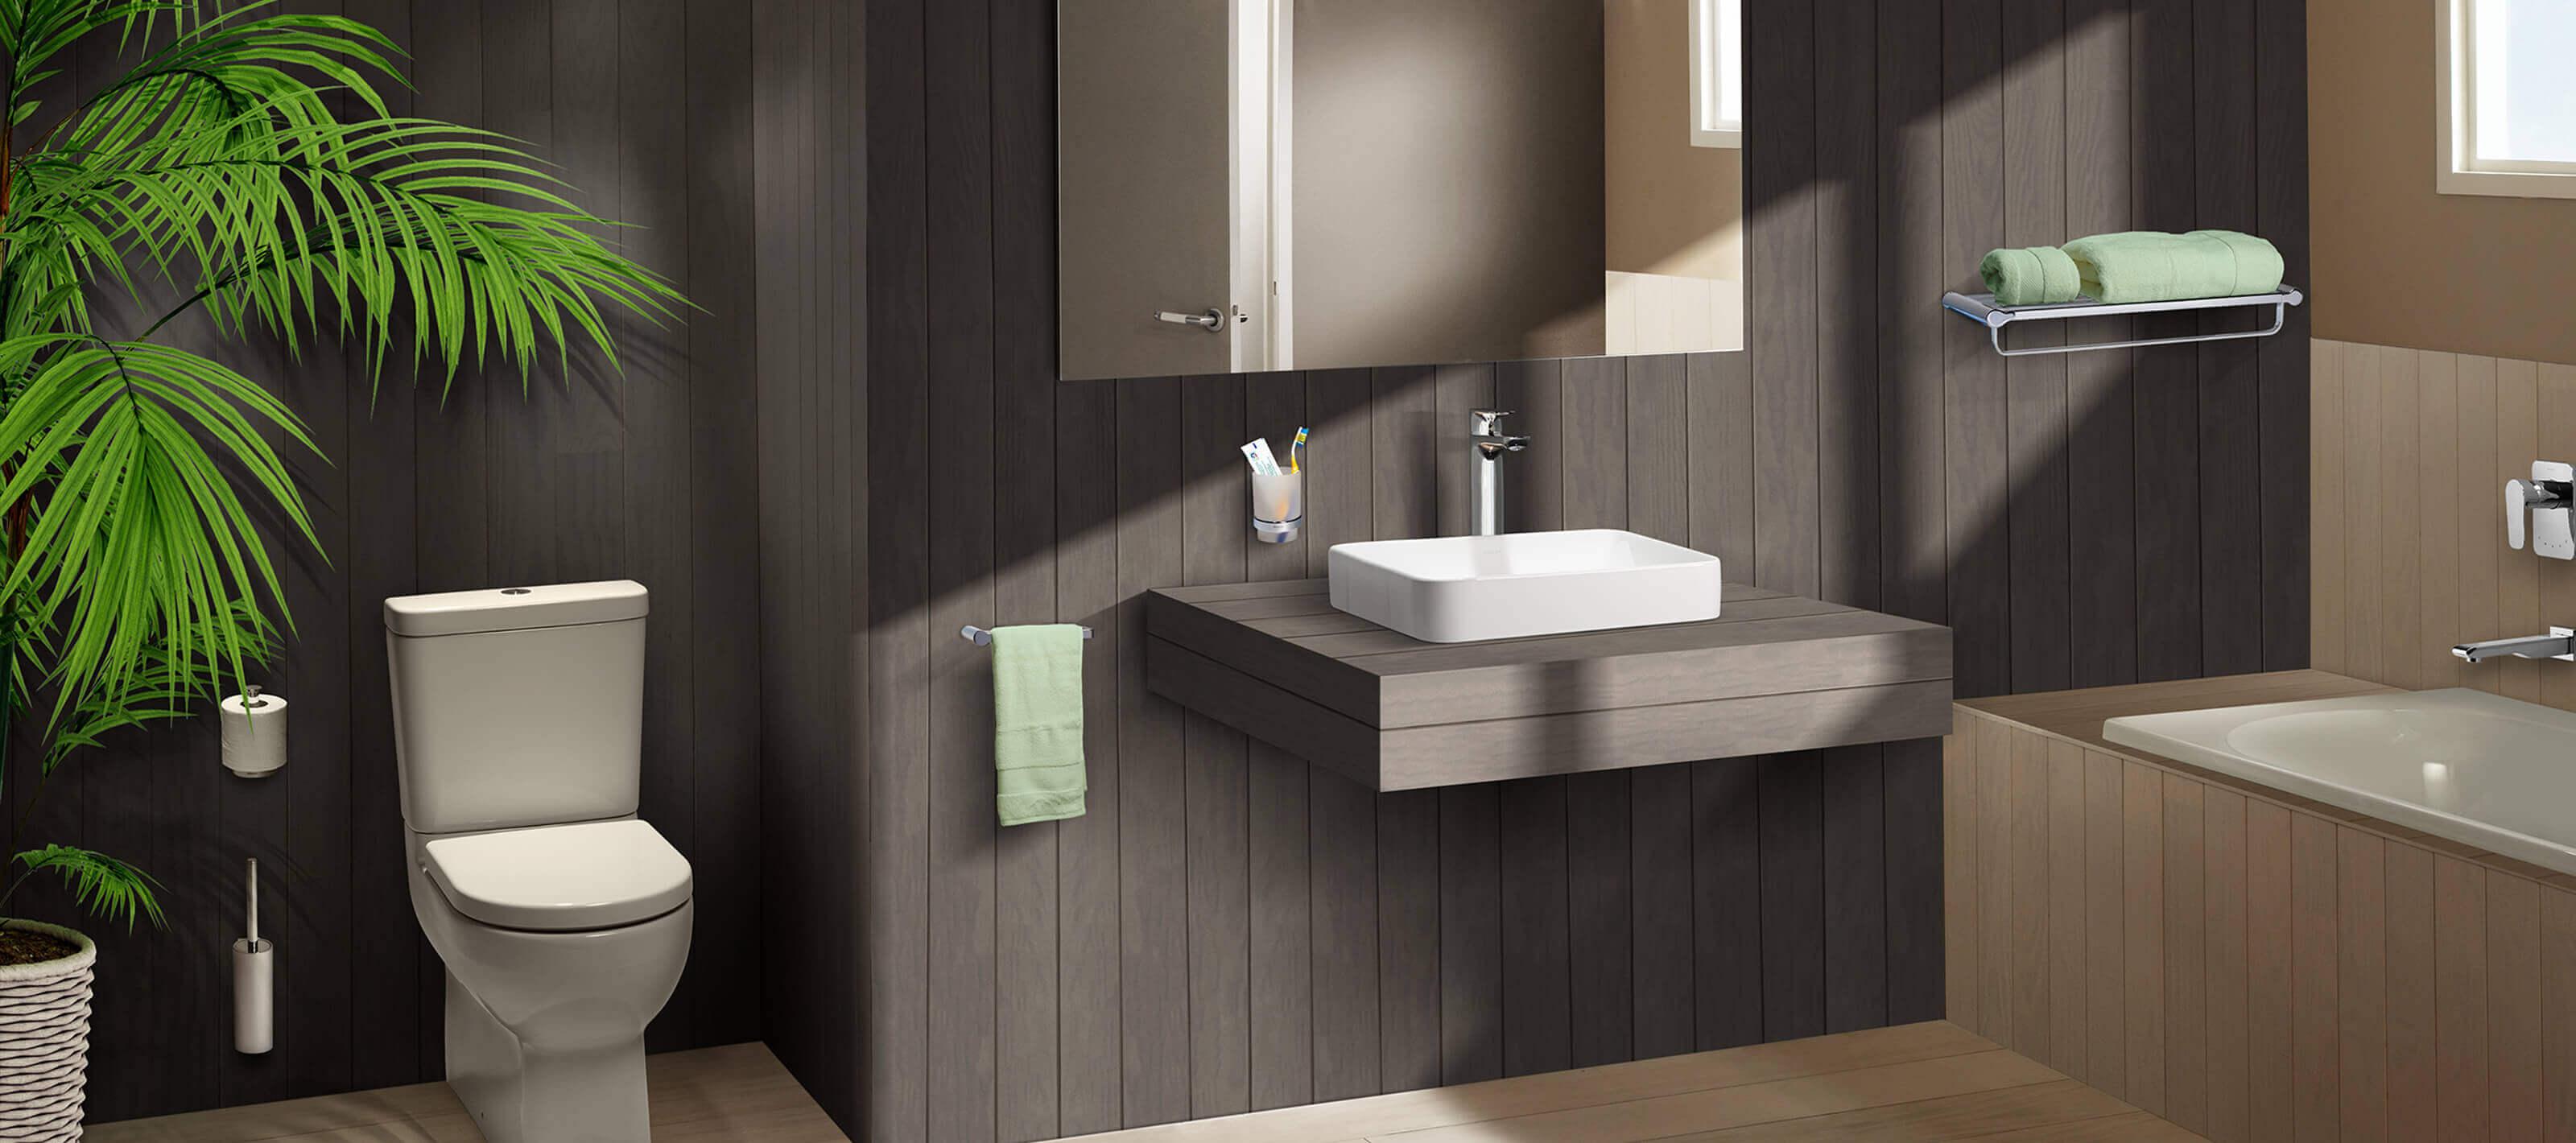 Baths Basins Tiles Vanities Forme Bathroom Collection